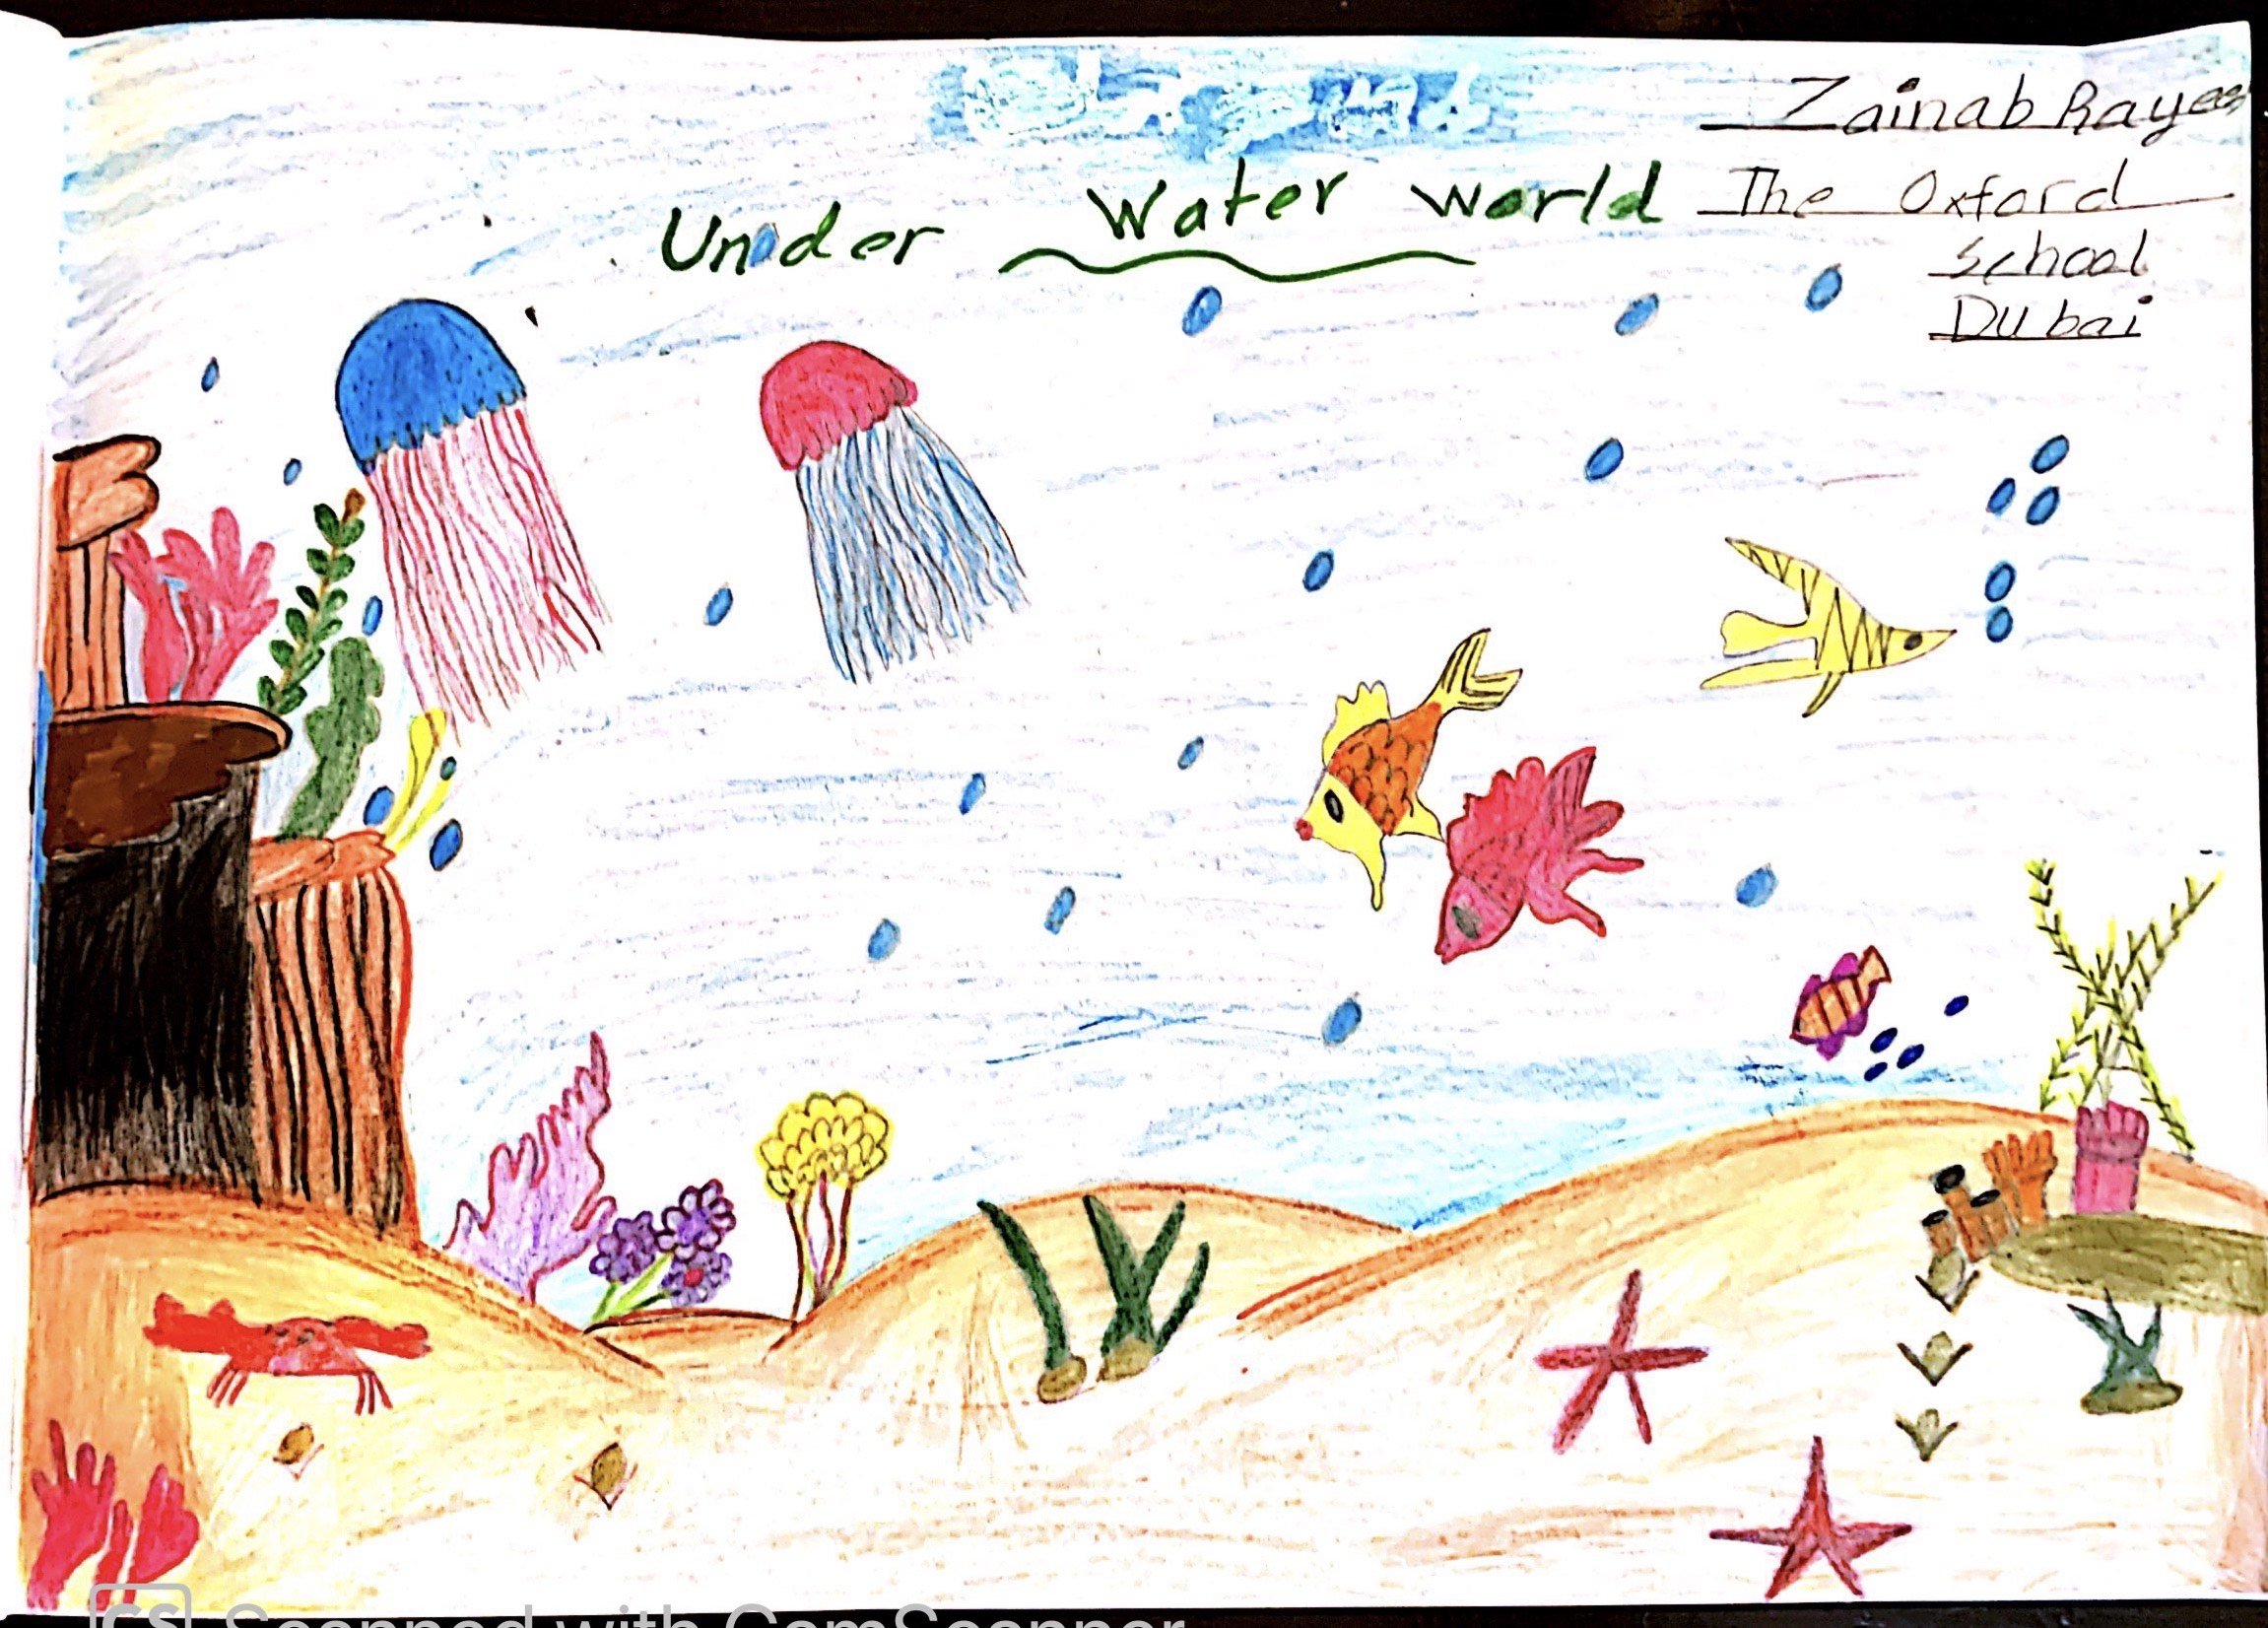 Under Water World by Zainab Rayees Kunhi